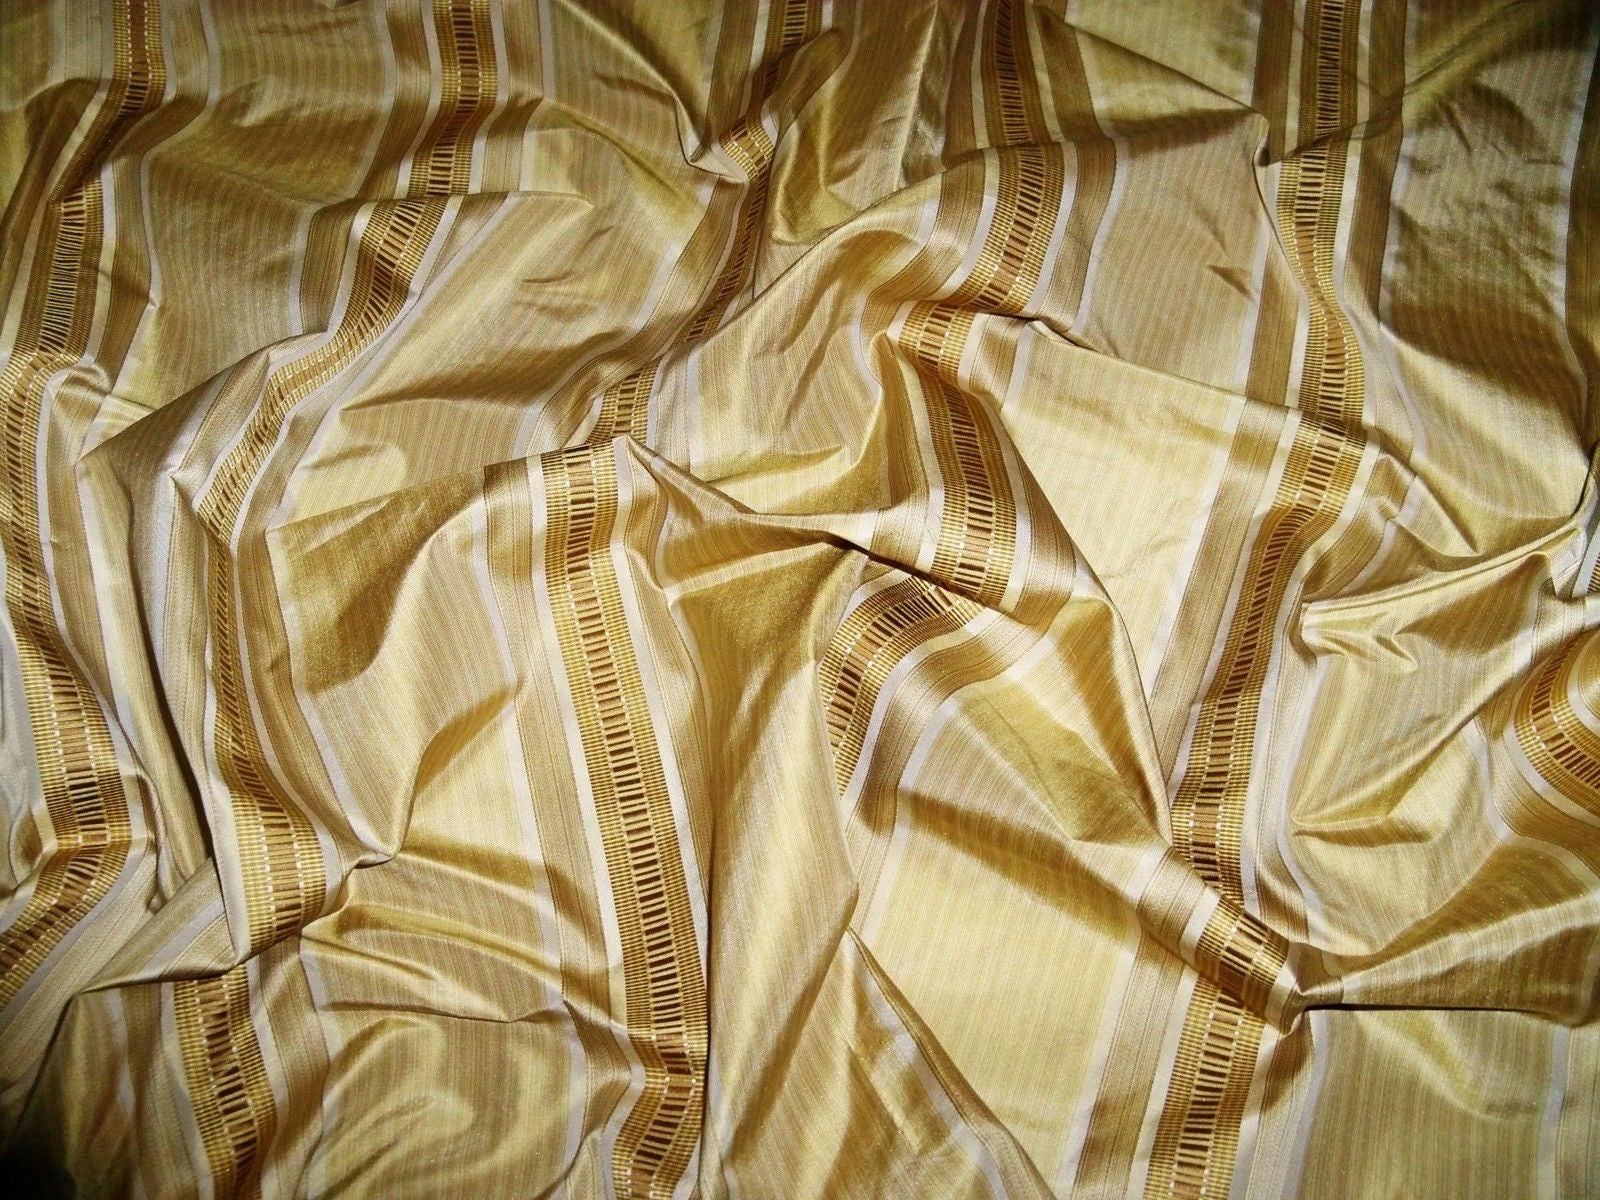 LEE JOFA KRAVET Couture Collins rayures tissu tissu tissu damassé de soie 10 verges miel ambre d'or 1f4aaf